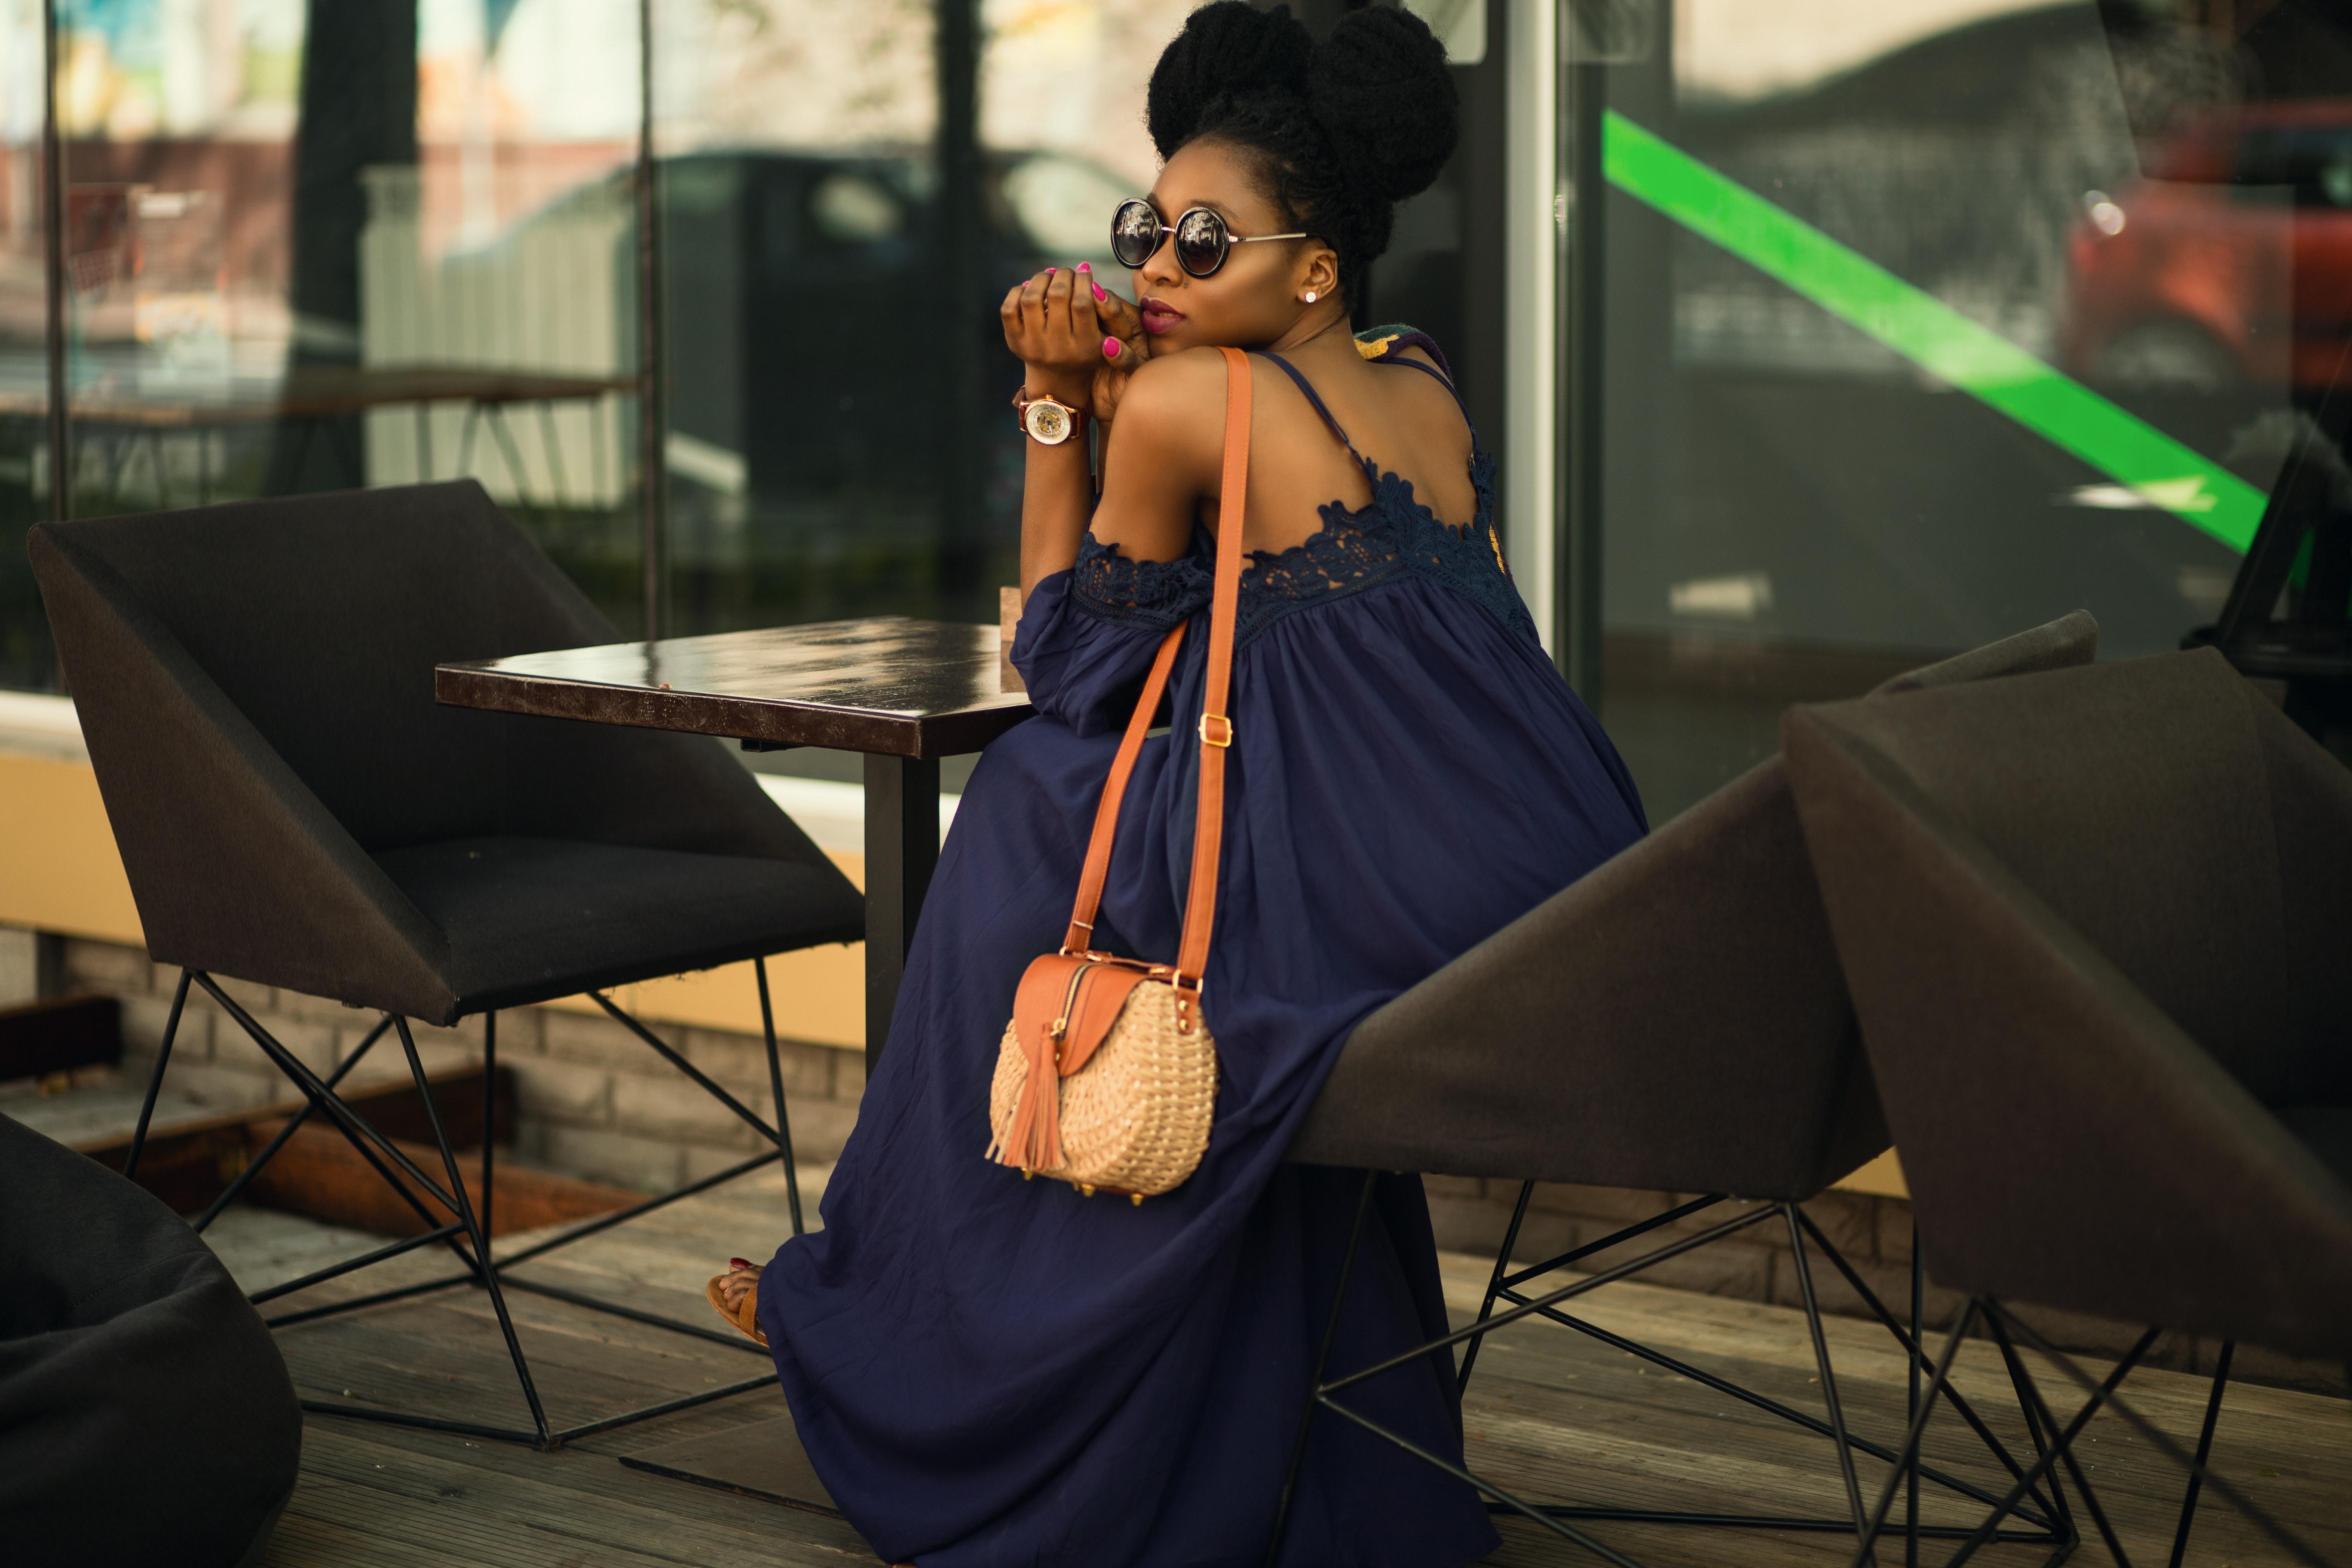 Woman Wearing Blue Spaghetti Strap Dress, Adult, Outdoor, Wear, Summer, HQ Photo